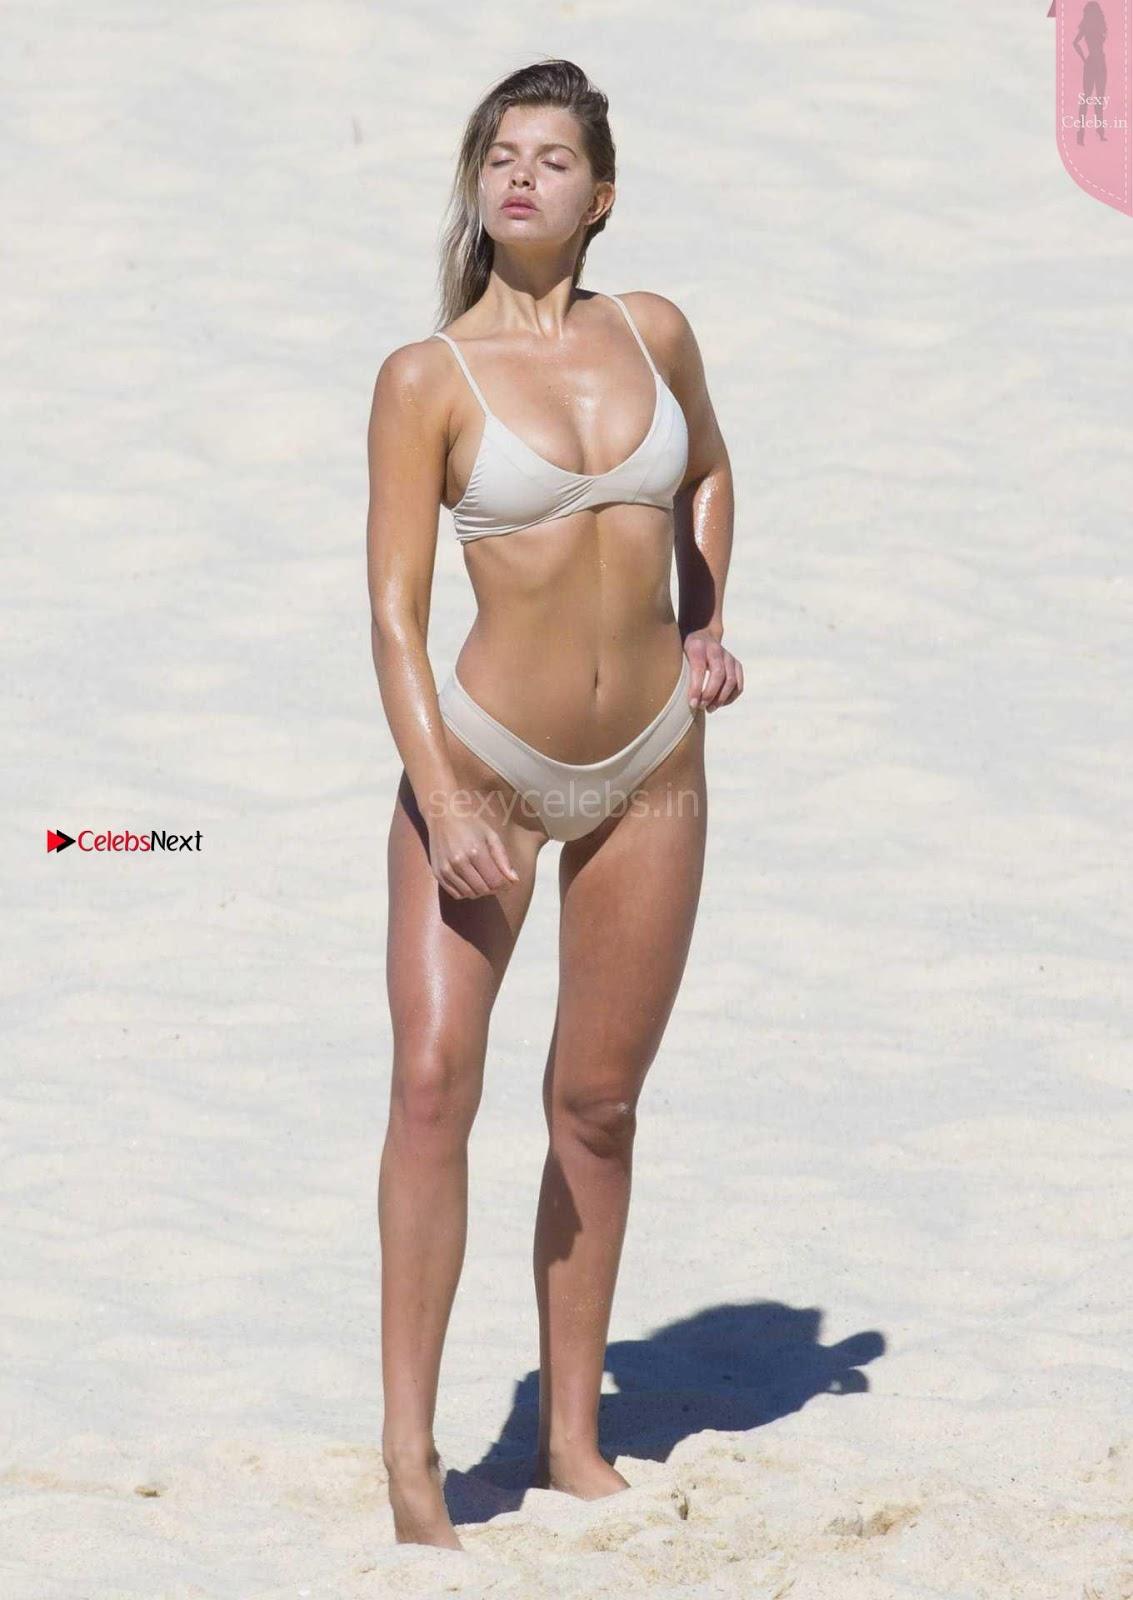 Kristina Mendonca Sexy tiny thongs Bikini Shoot WOW Sexy ass Beautiful Blond